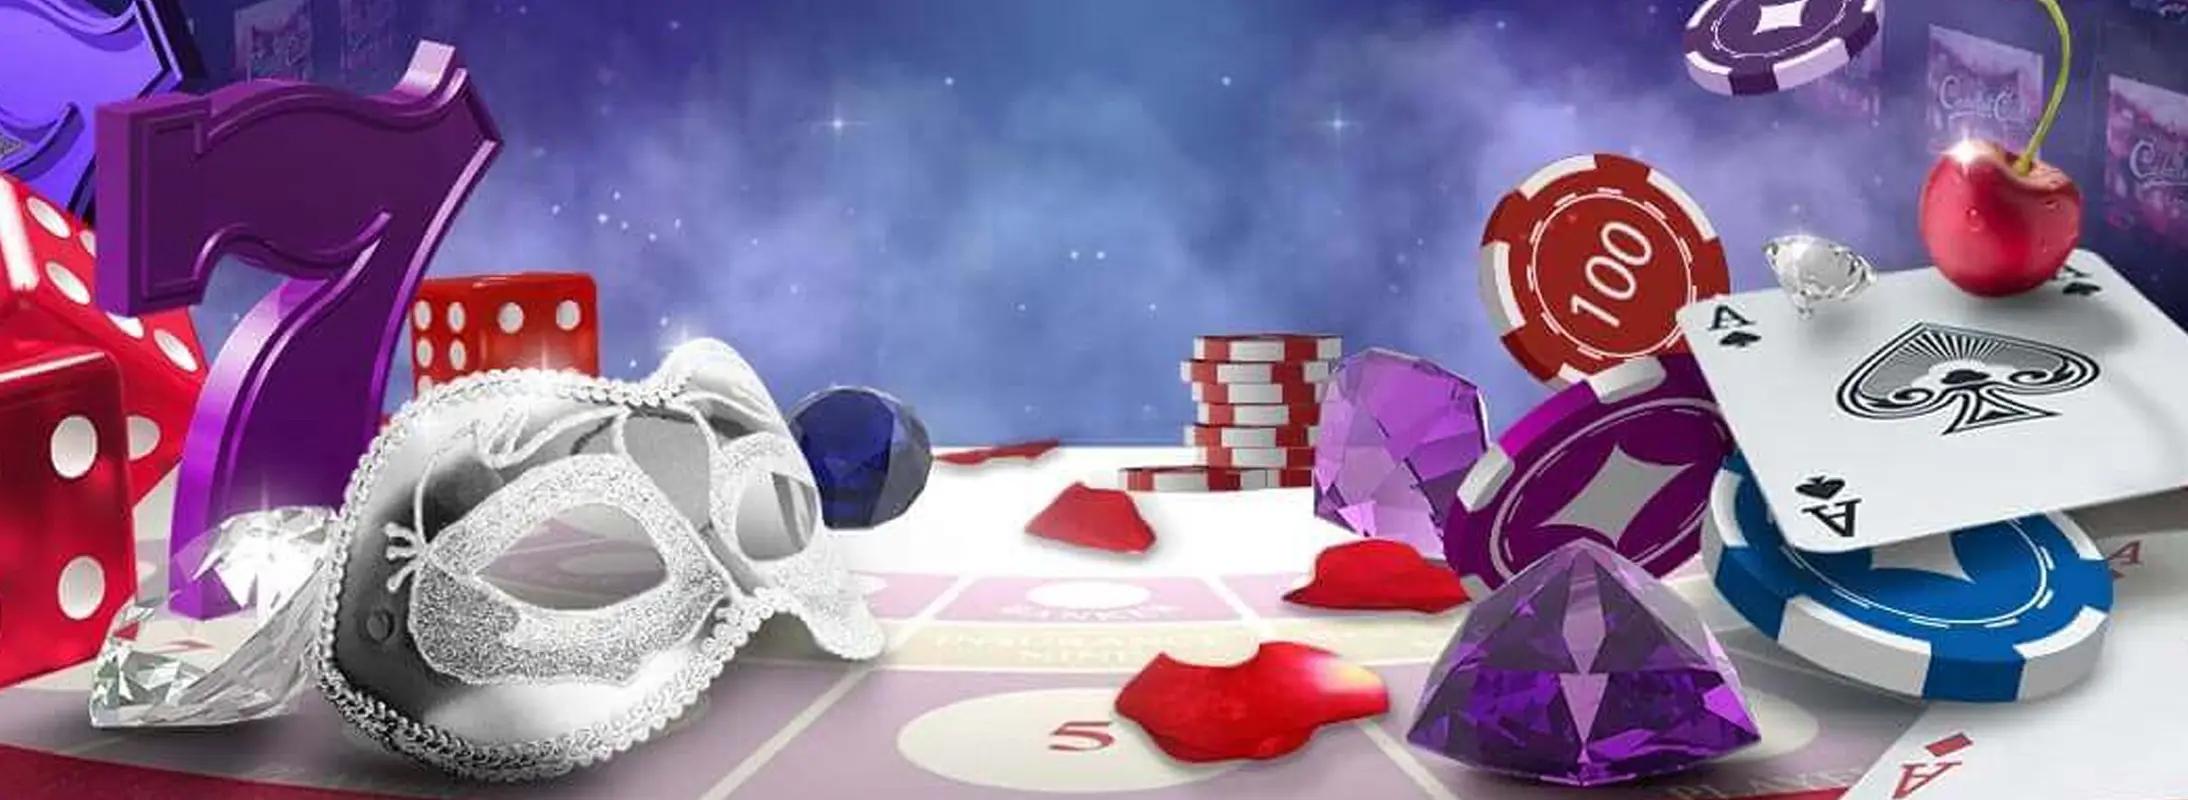 Mor deg med 6000 kroner pa Cabaret Club Casino - Norway CasinoTop Banner